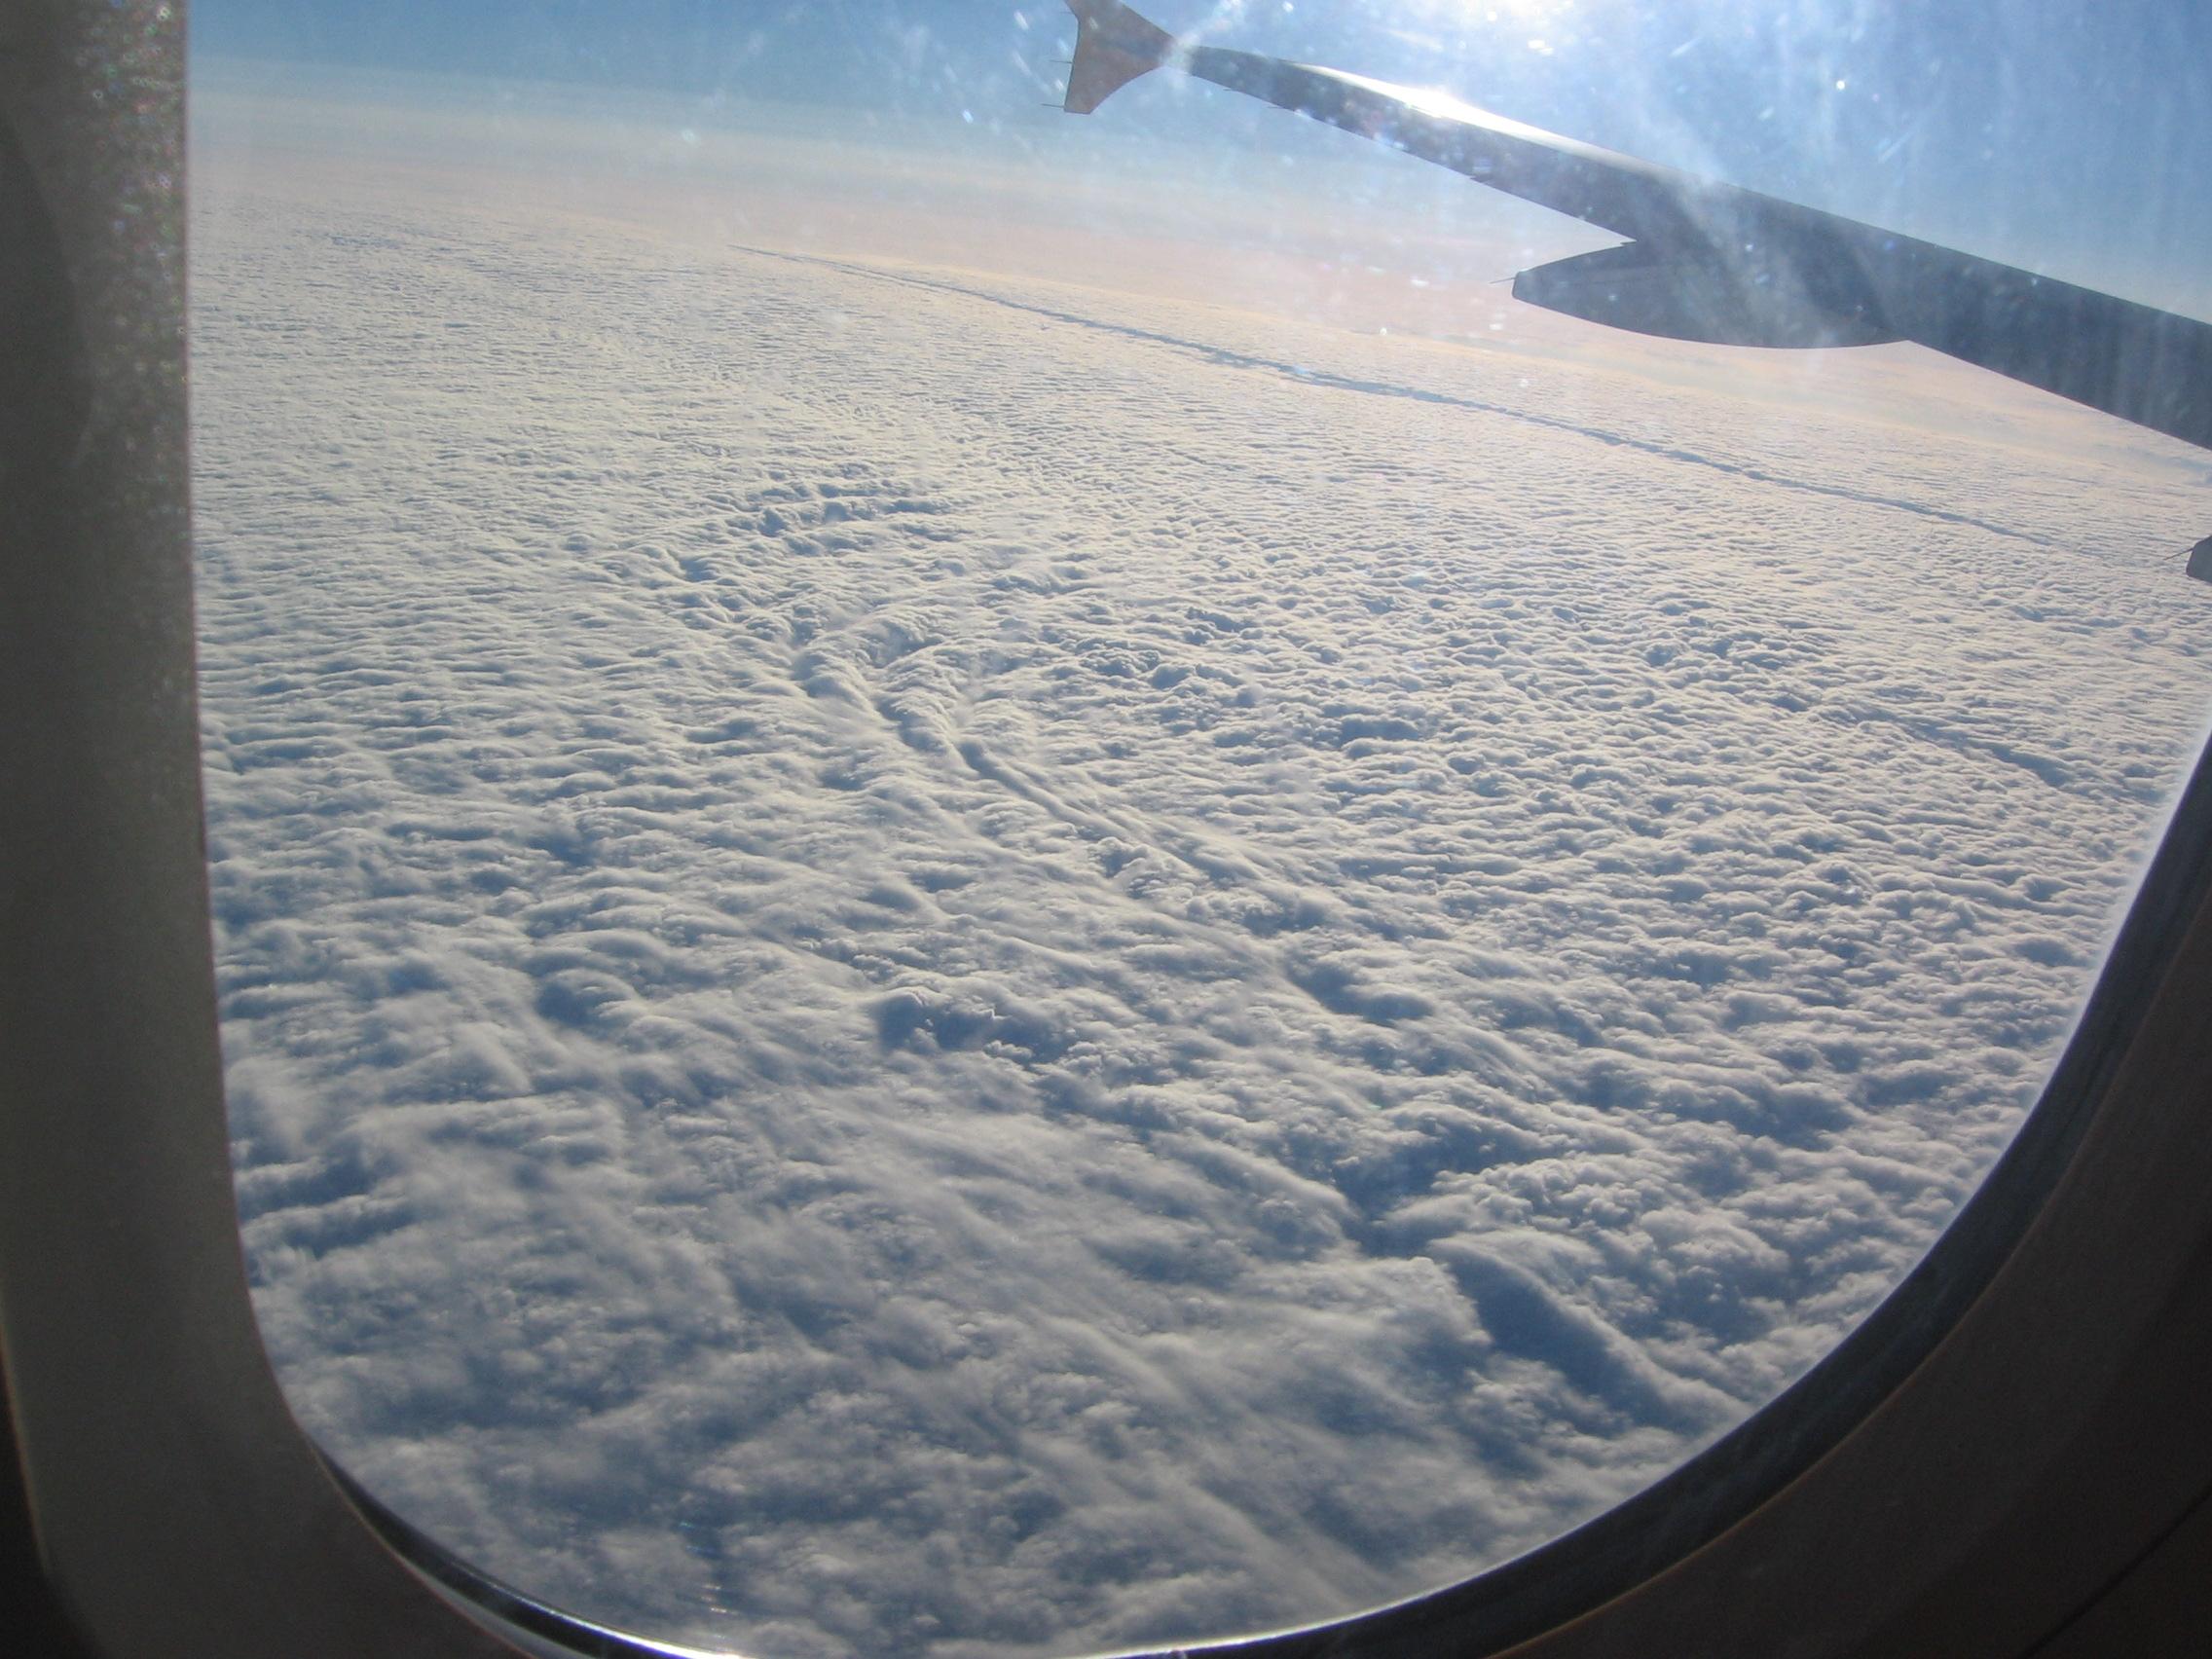 More wool clouds